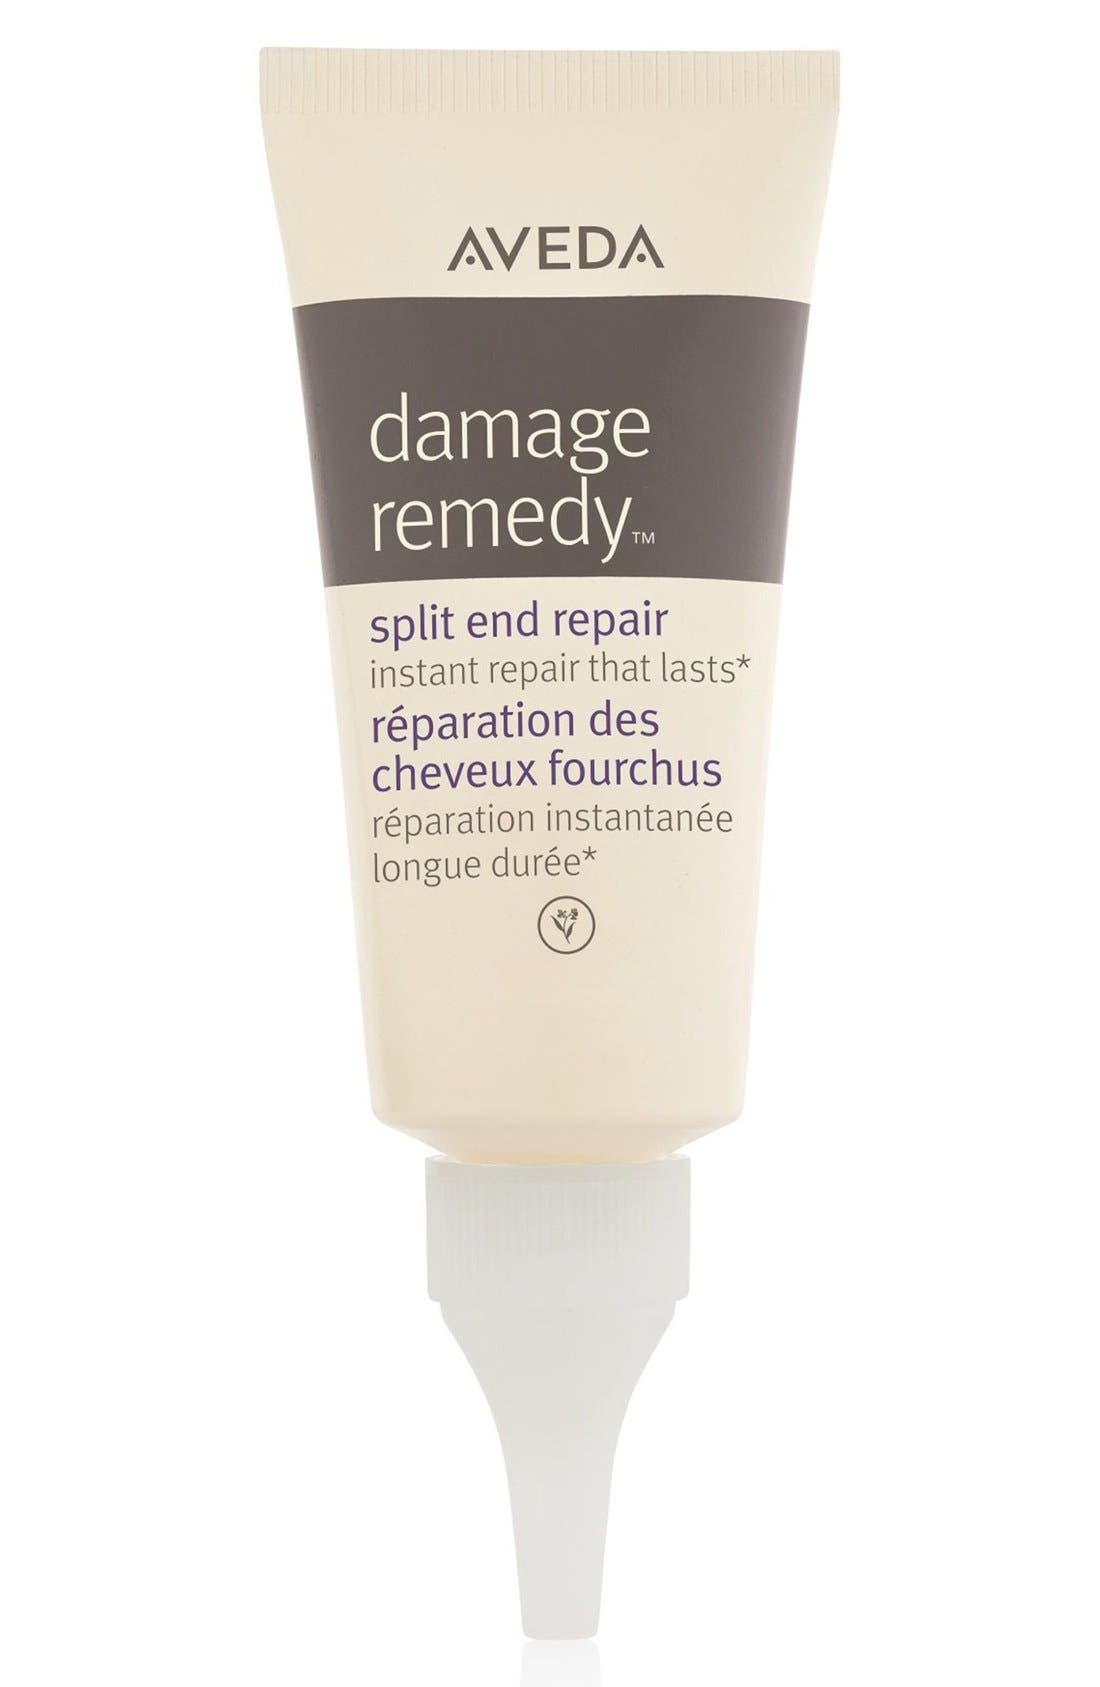 Aveda damage remedy™ Split End Repair